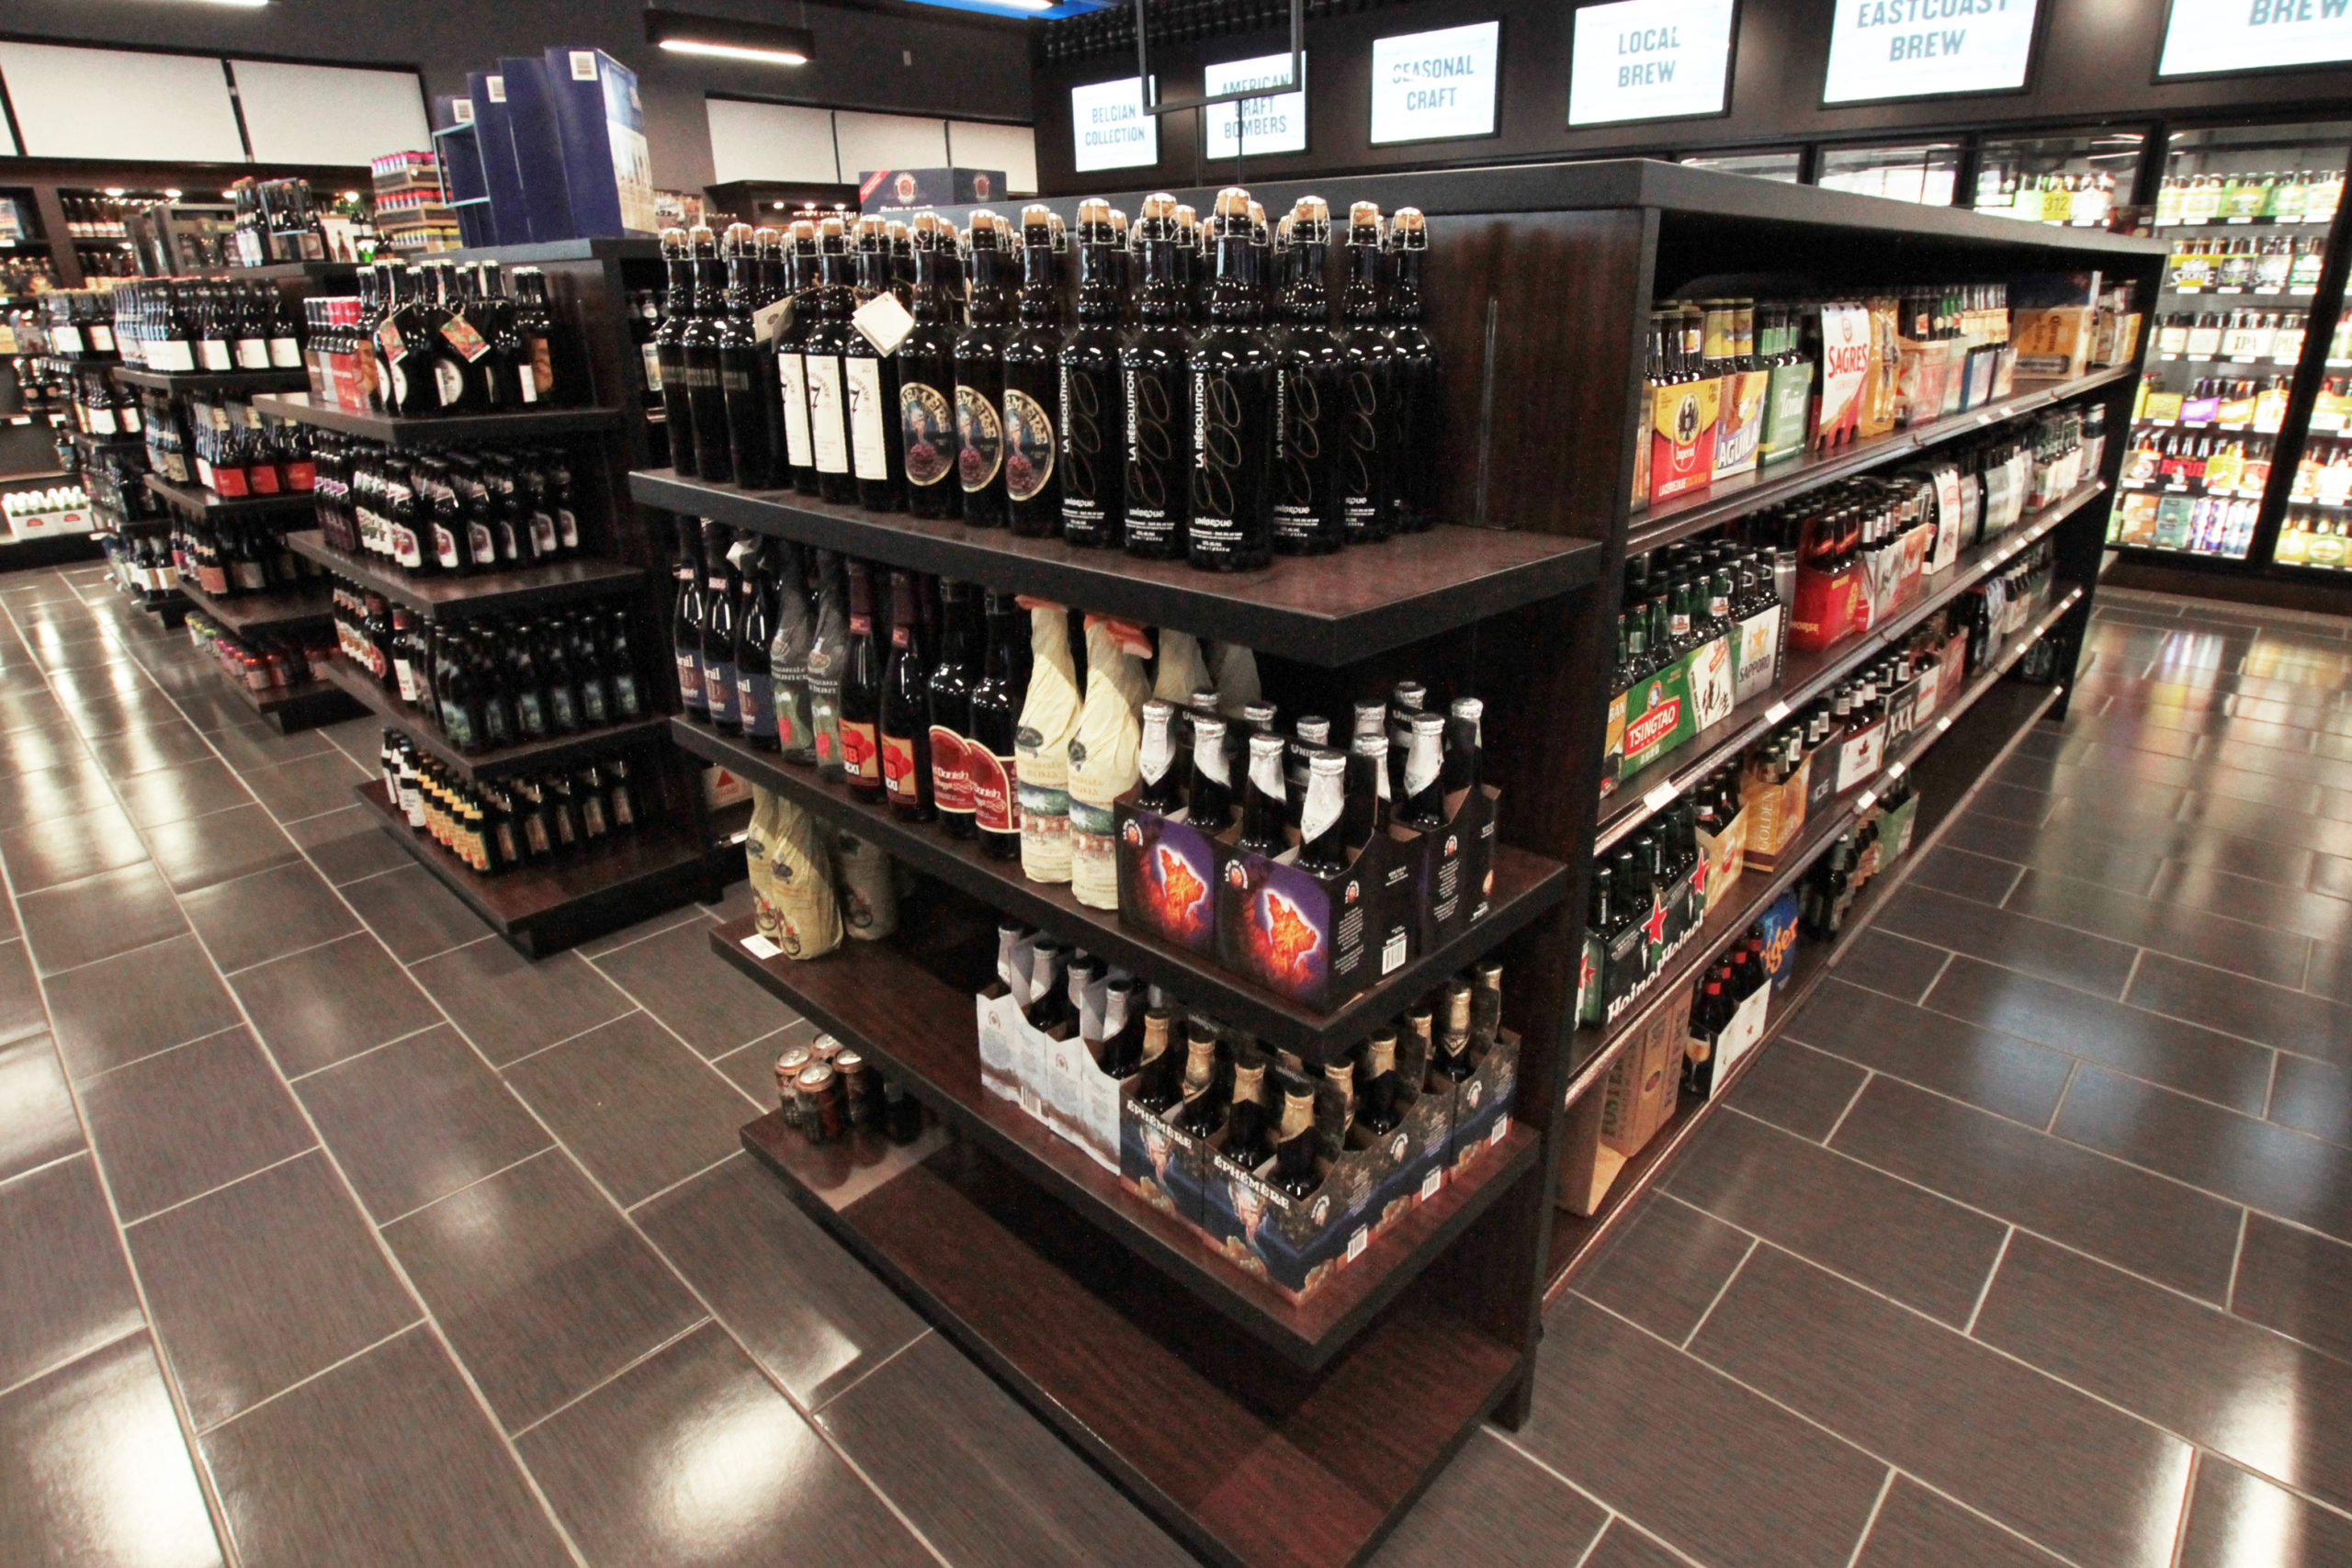 wine display, wood fixtures, retail display, signage, liquor display, gondola